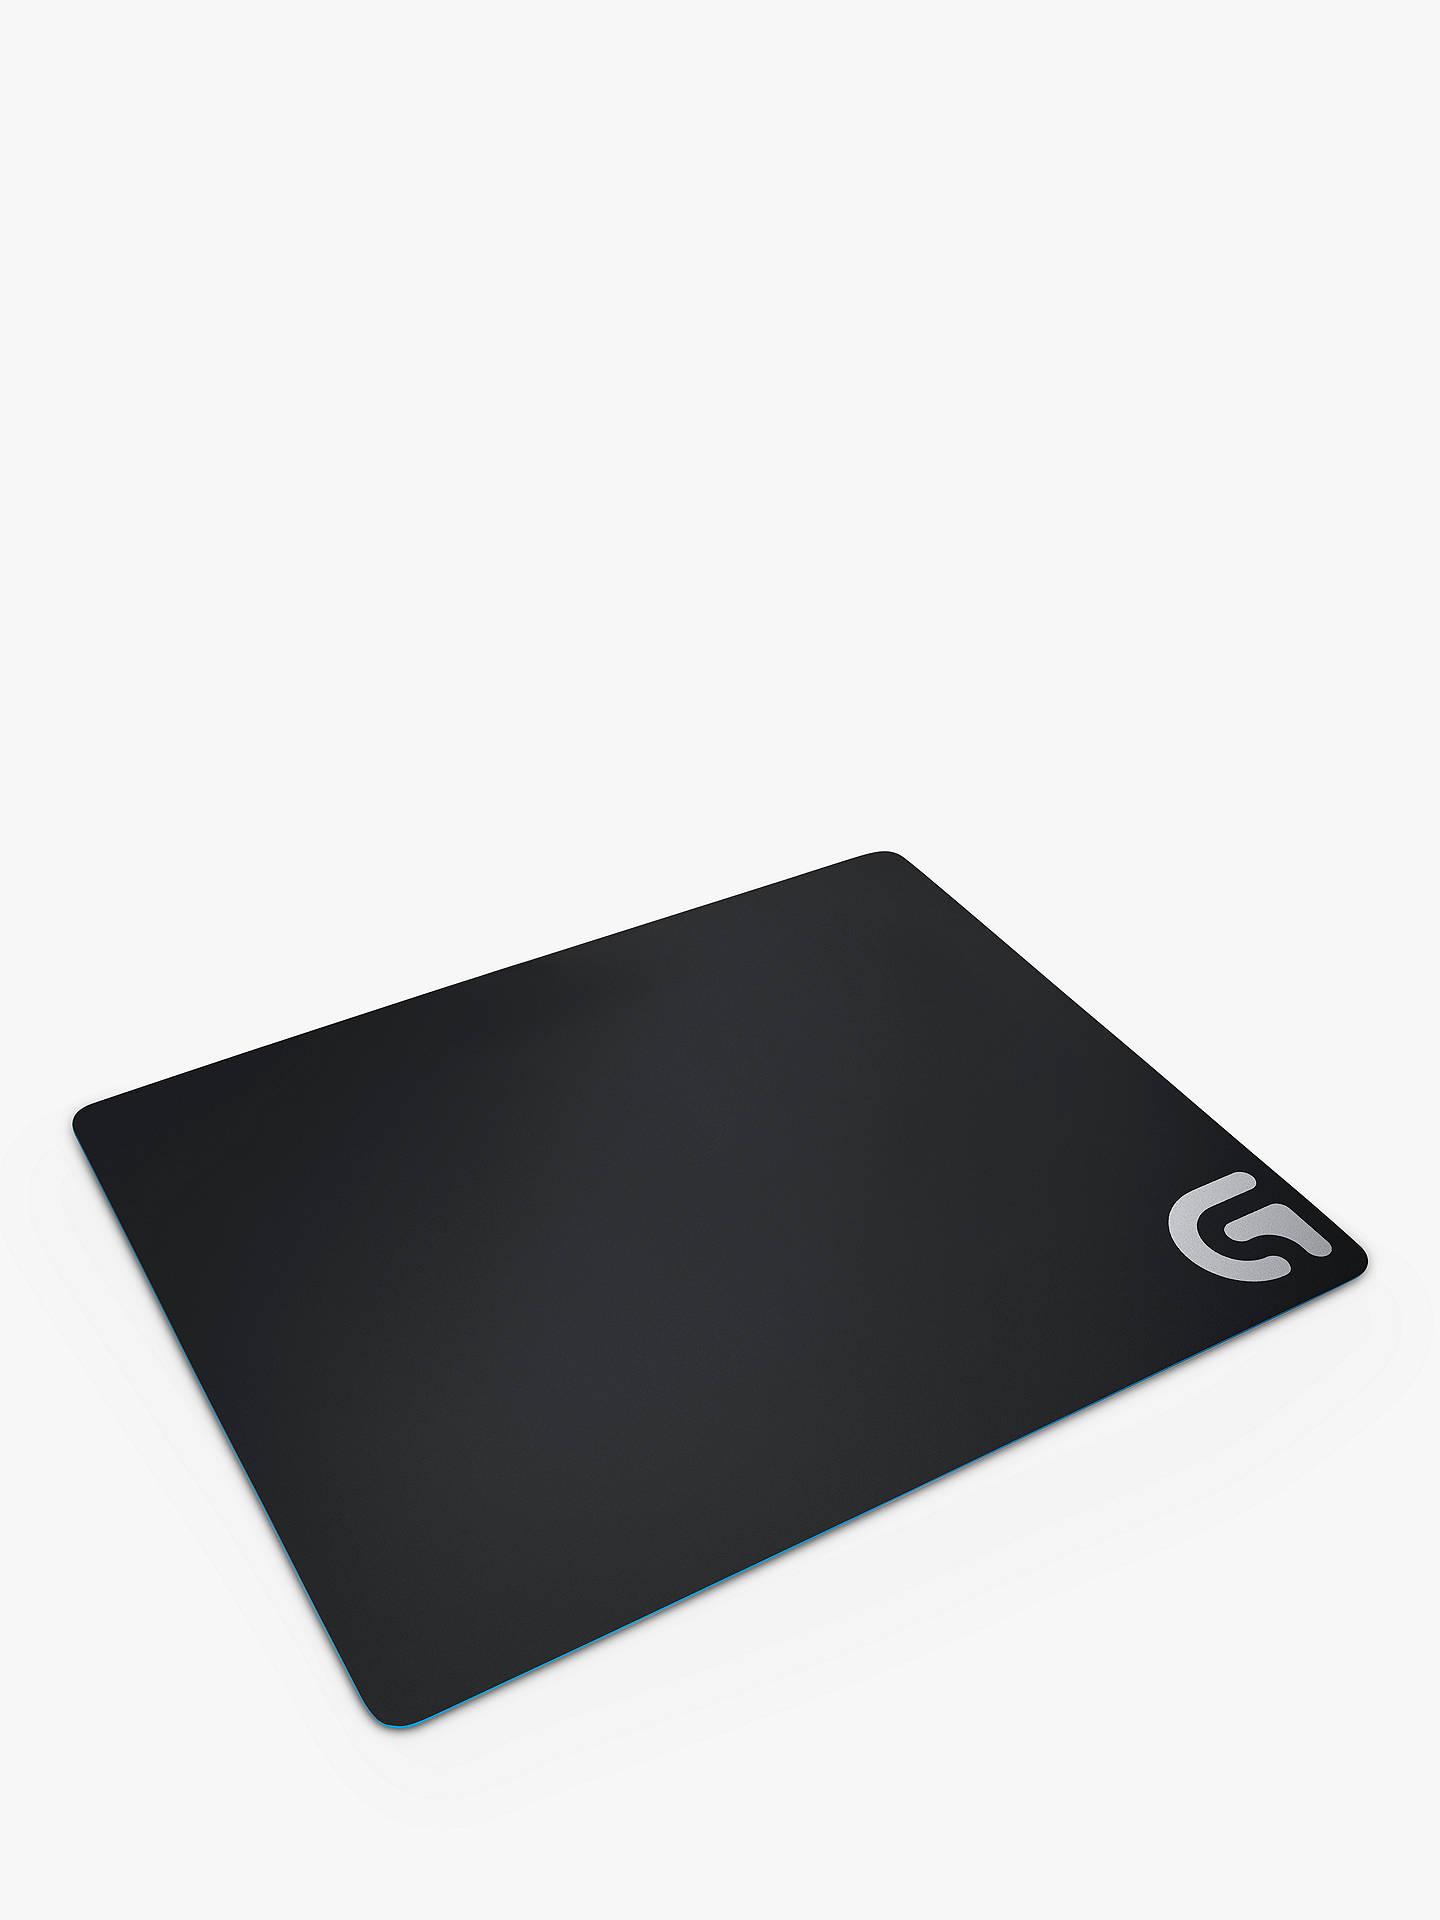 c7f76a7fa7c Buy Logitech G440 Hard Gaming Mouse Pad, Black Online at johnlewis.com ...